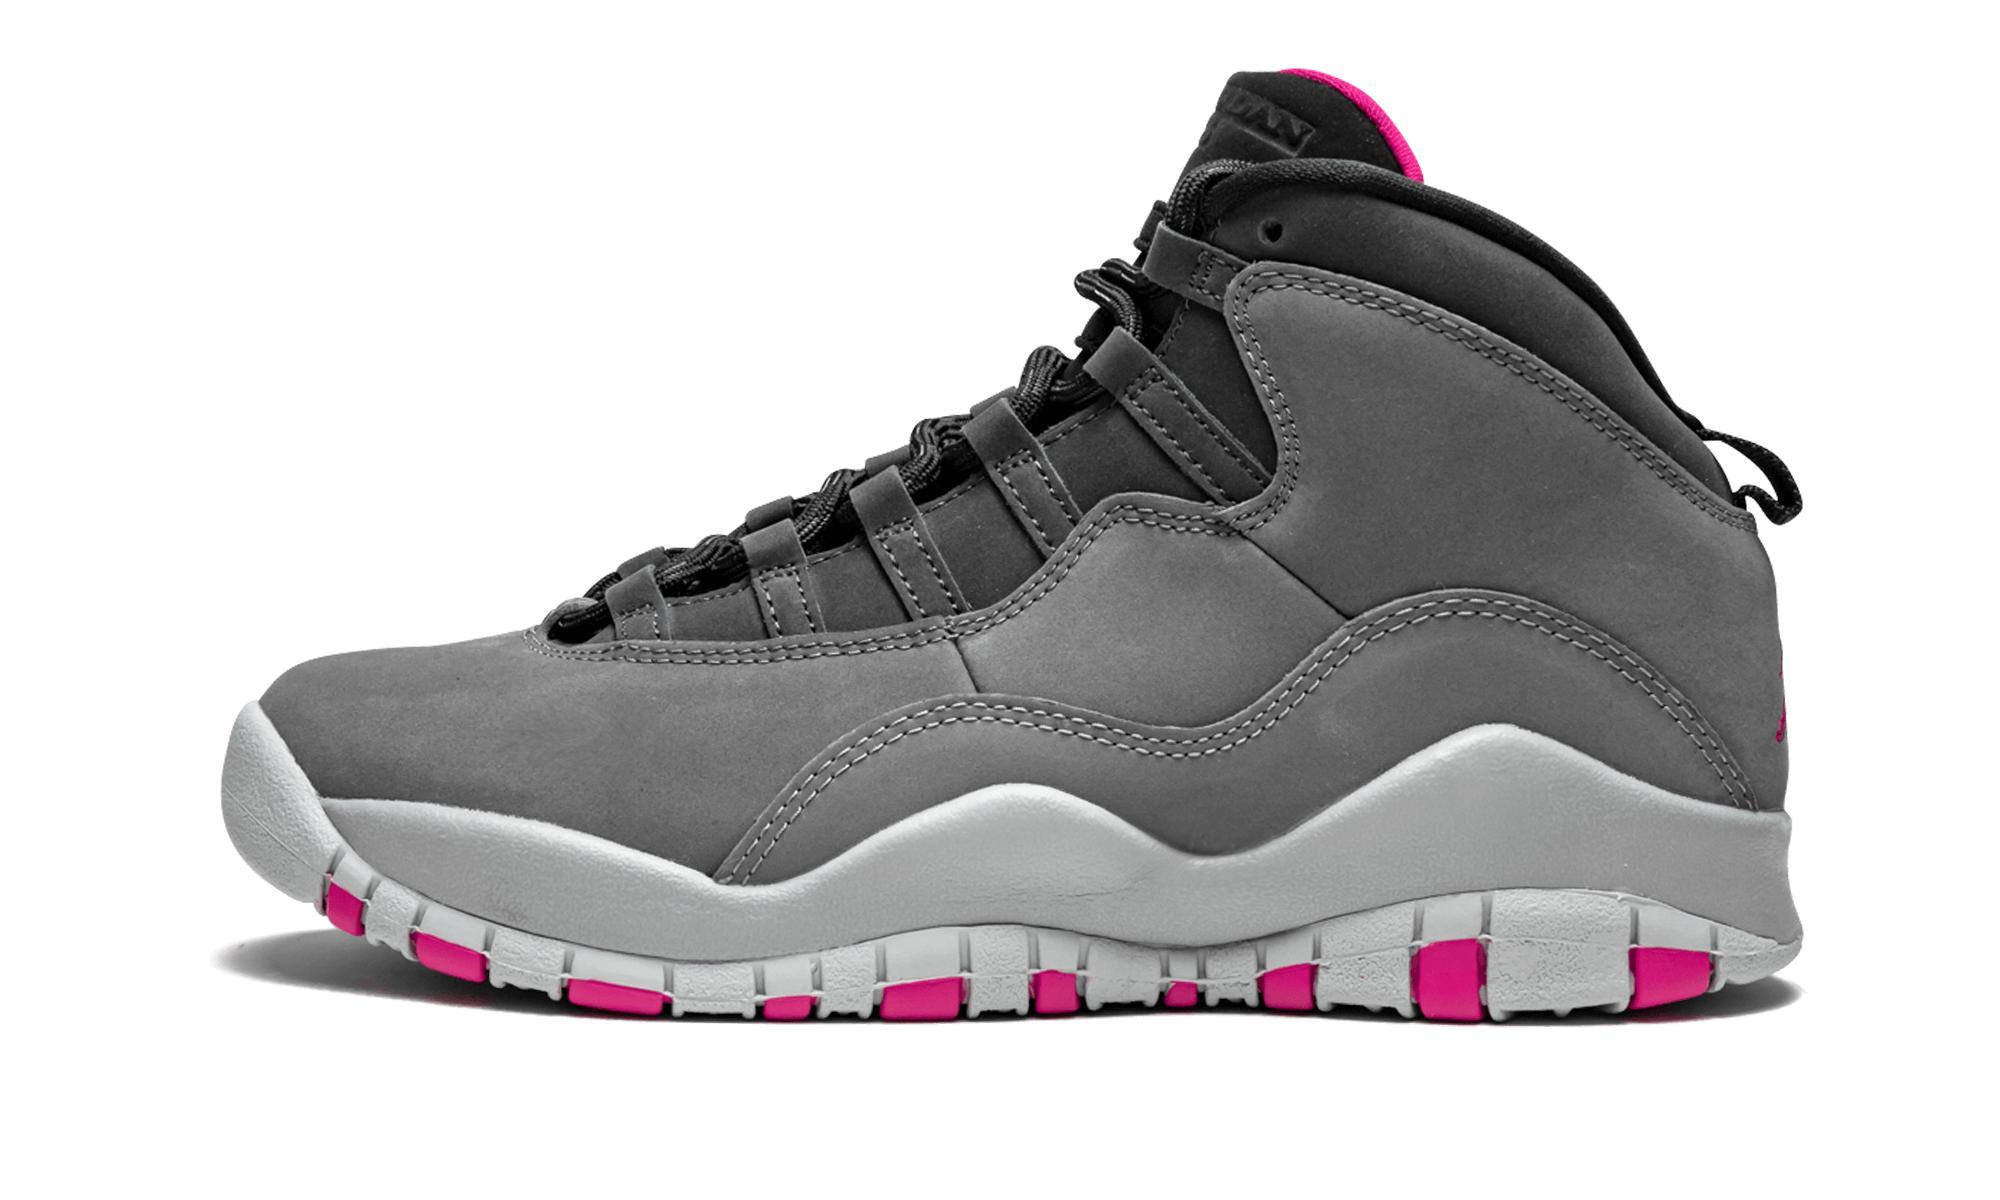 8ad031a38e17d9 Lyst - Nike Air 10 Retro (gs) in Gray for Men